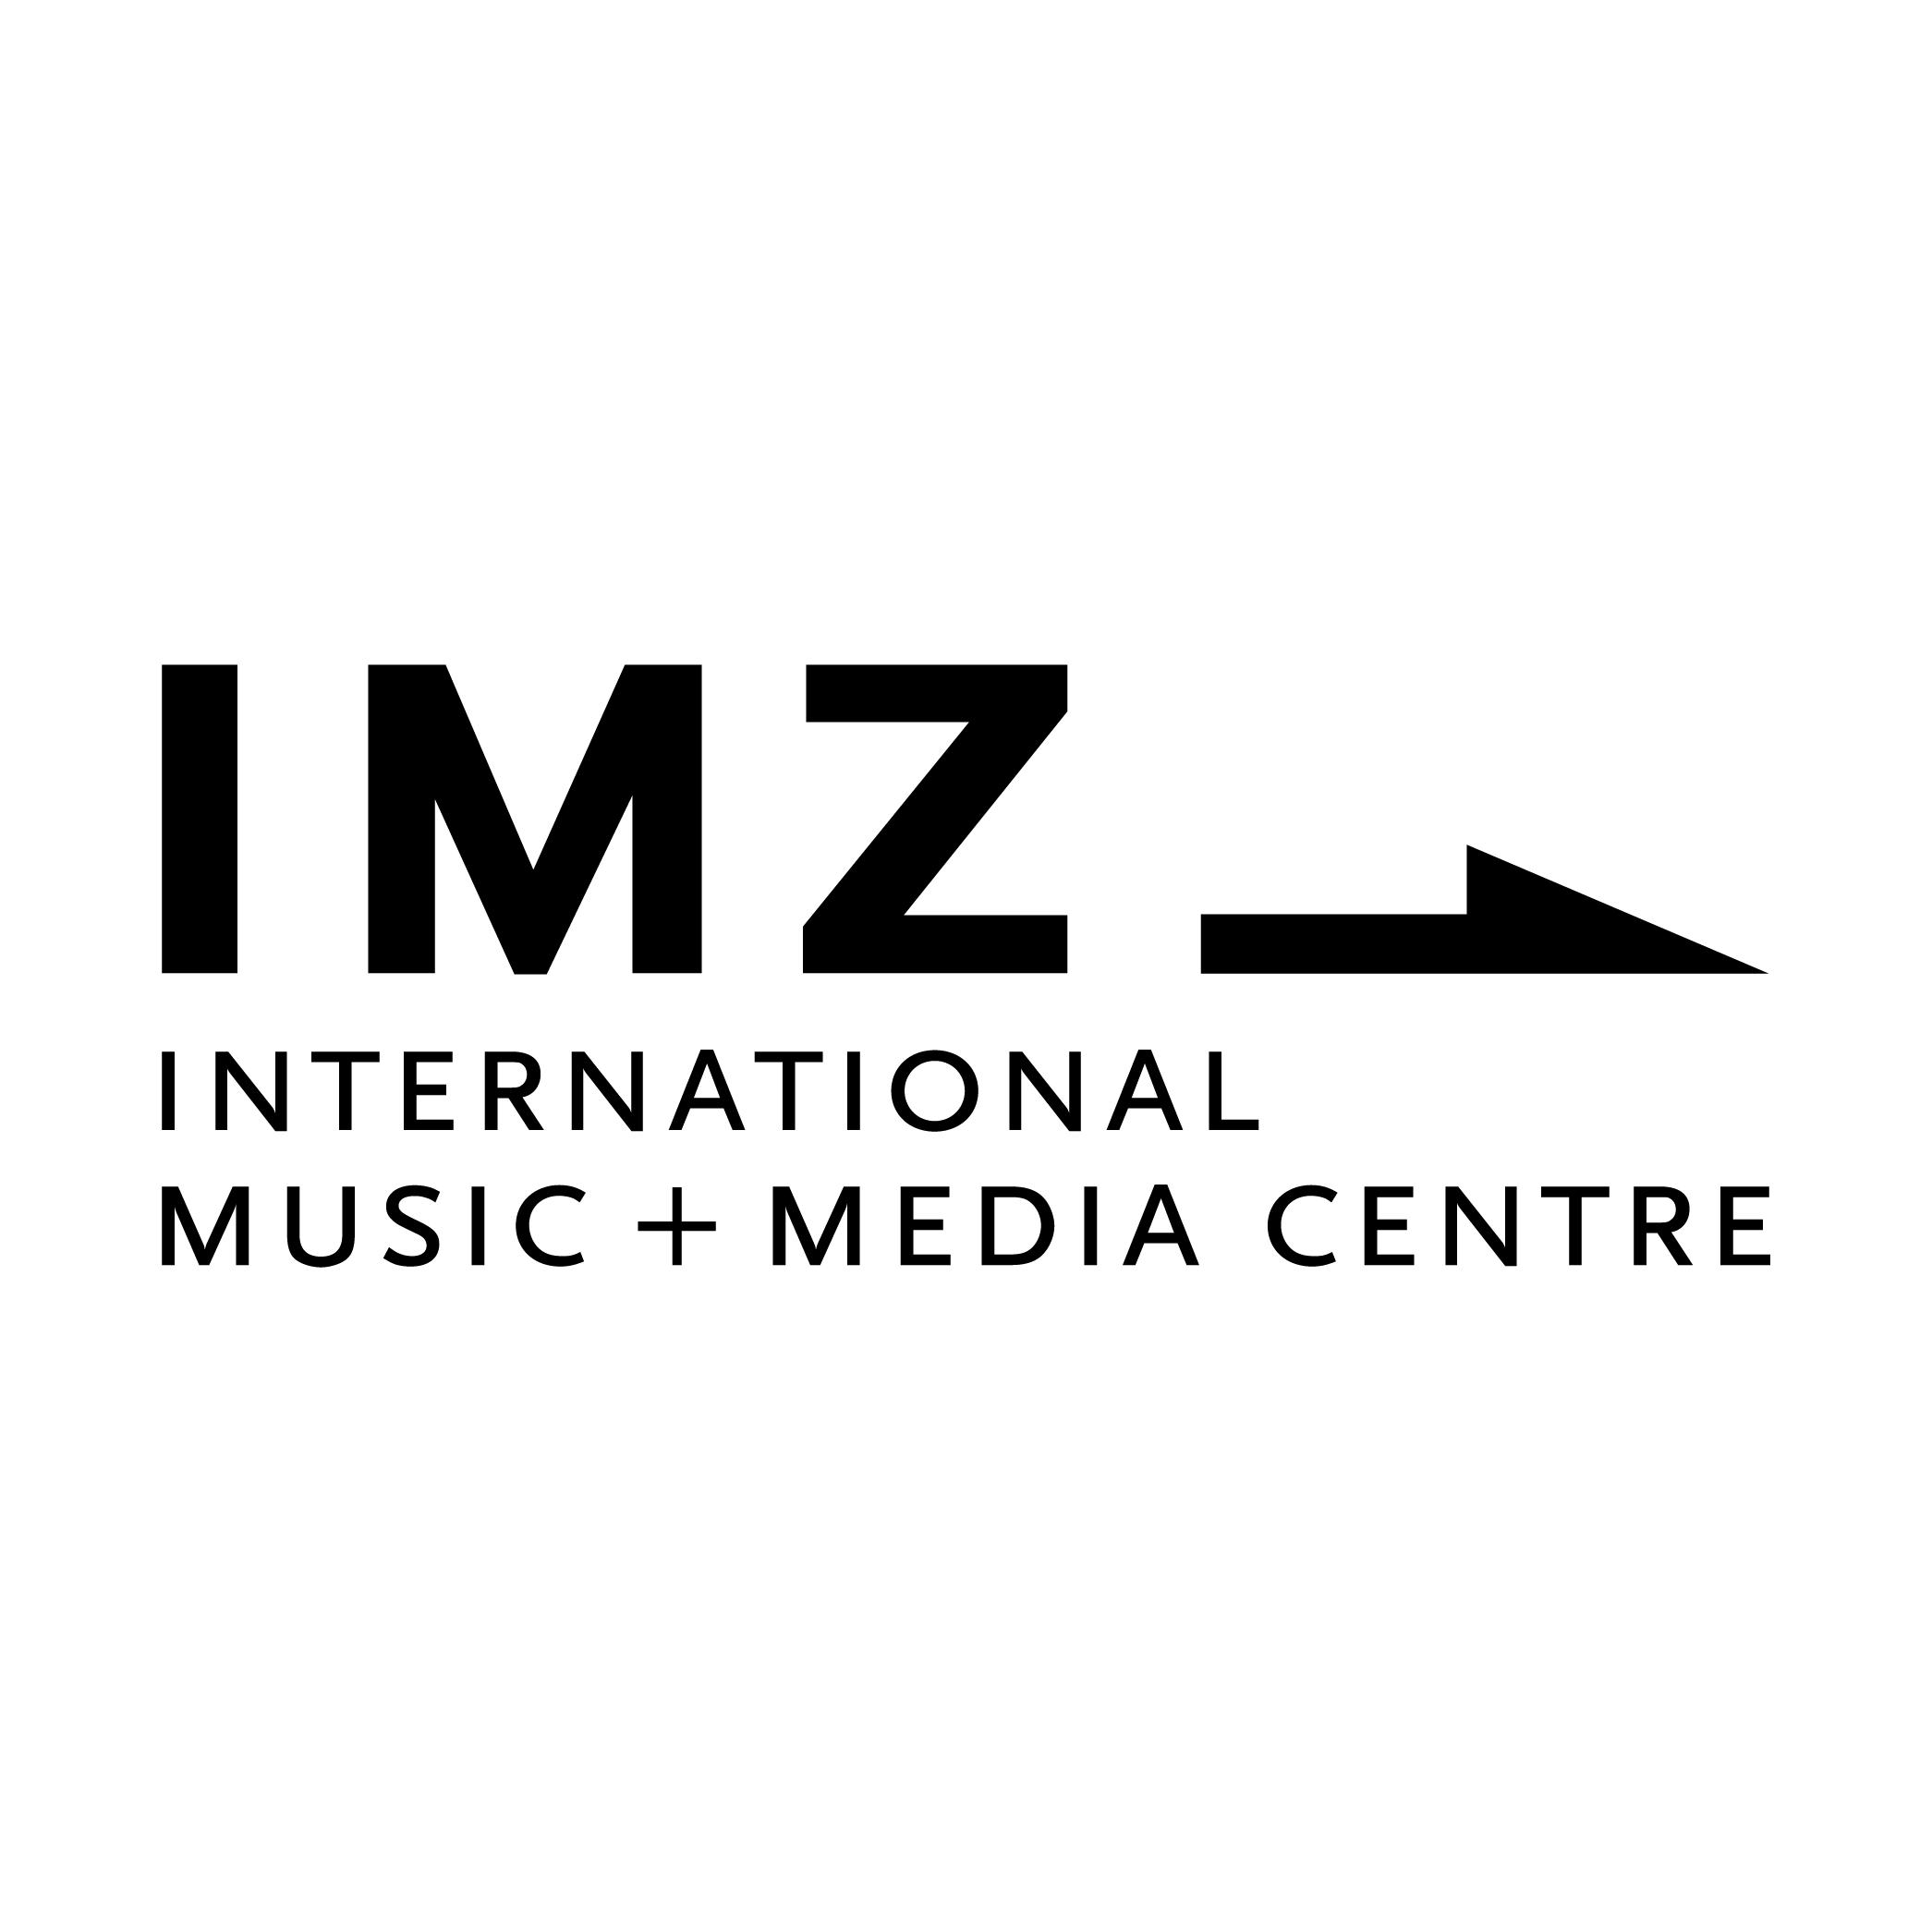 IMZ International Music + Media Centre